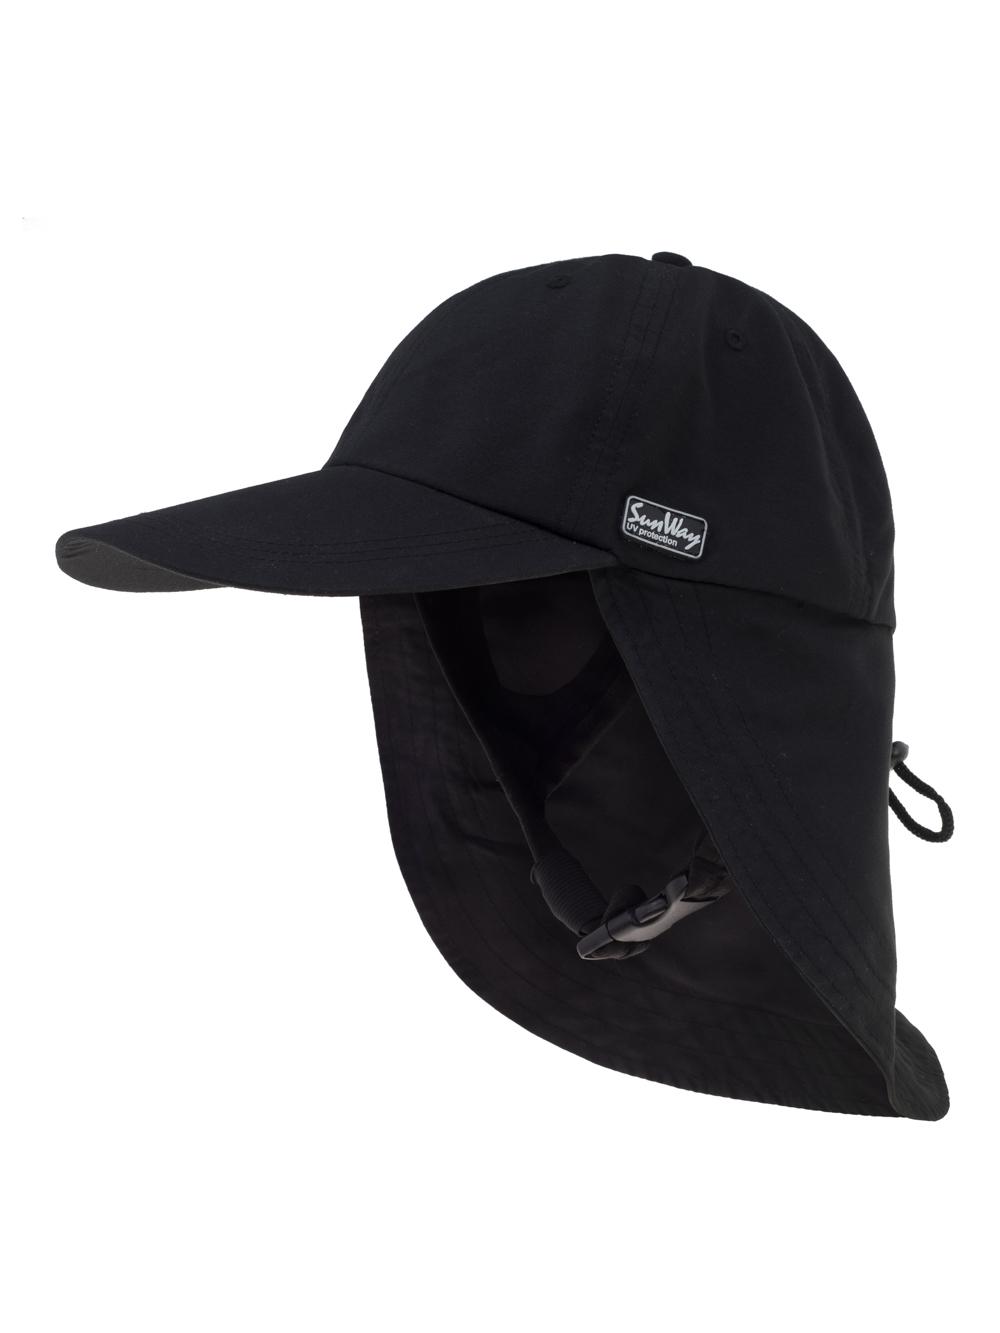 778de3d1b SunWay's UV Legionnaire Cap With a harness